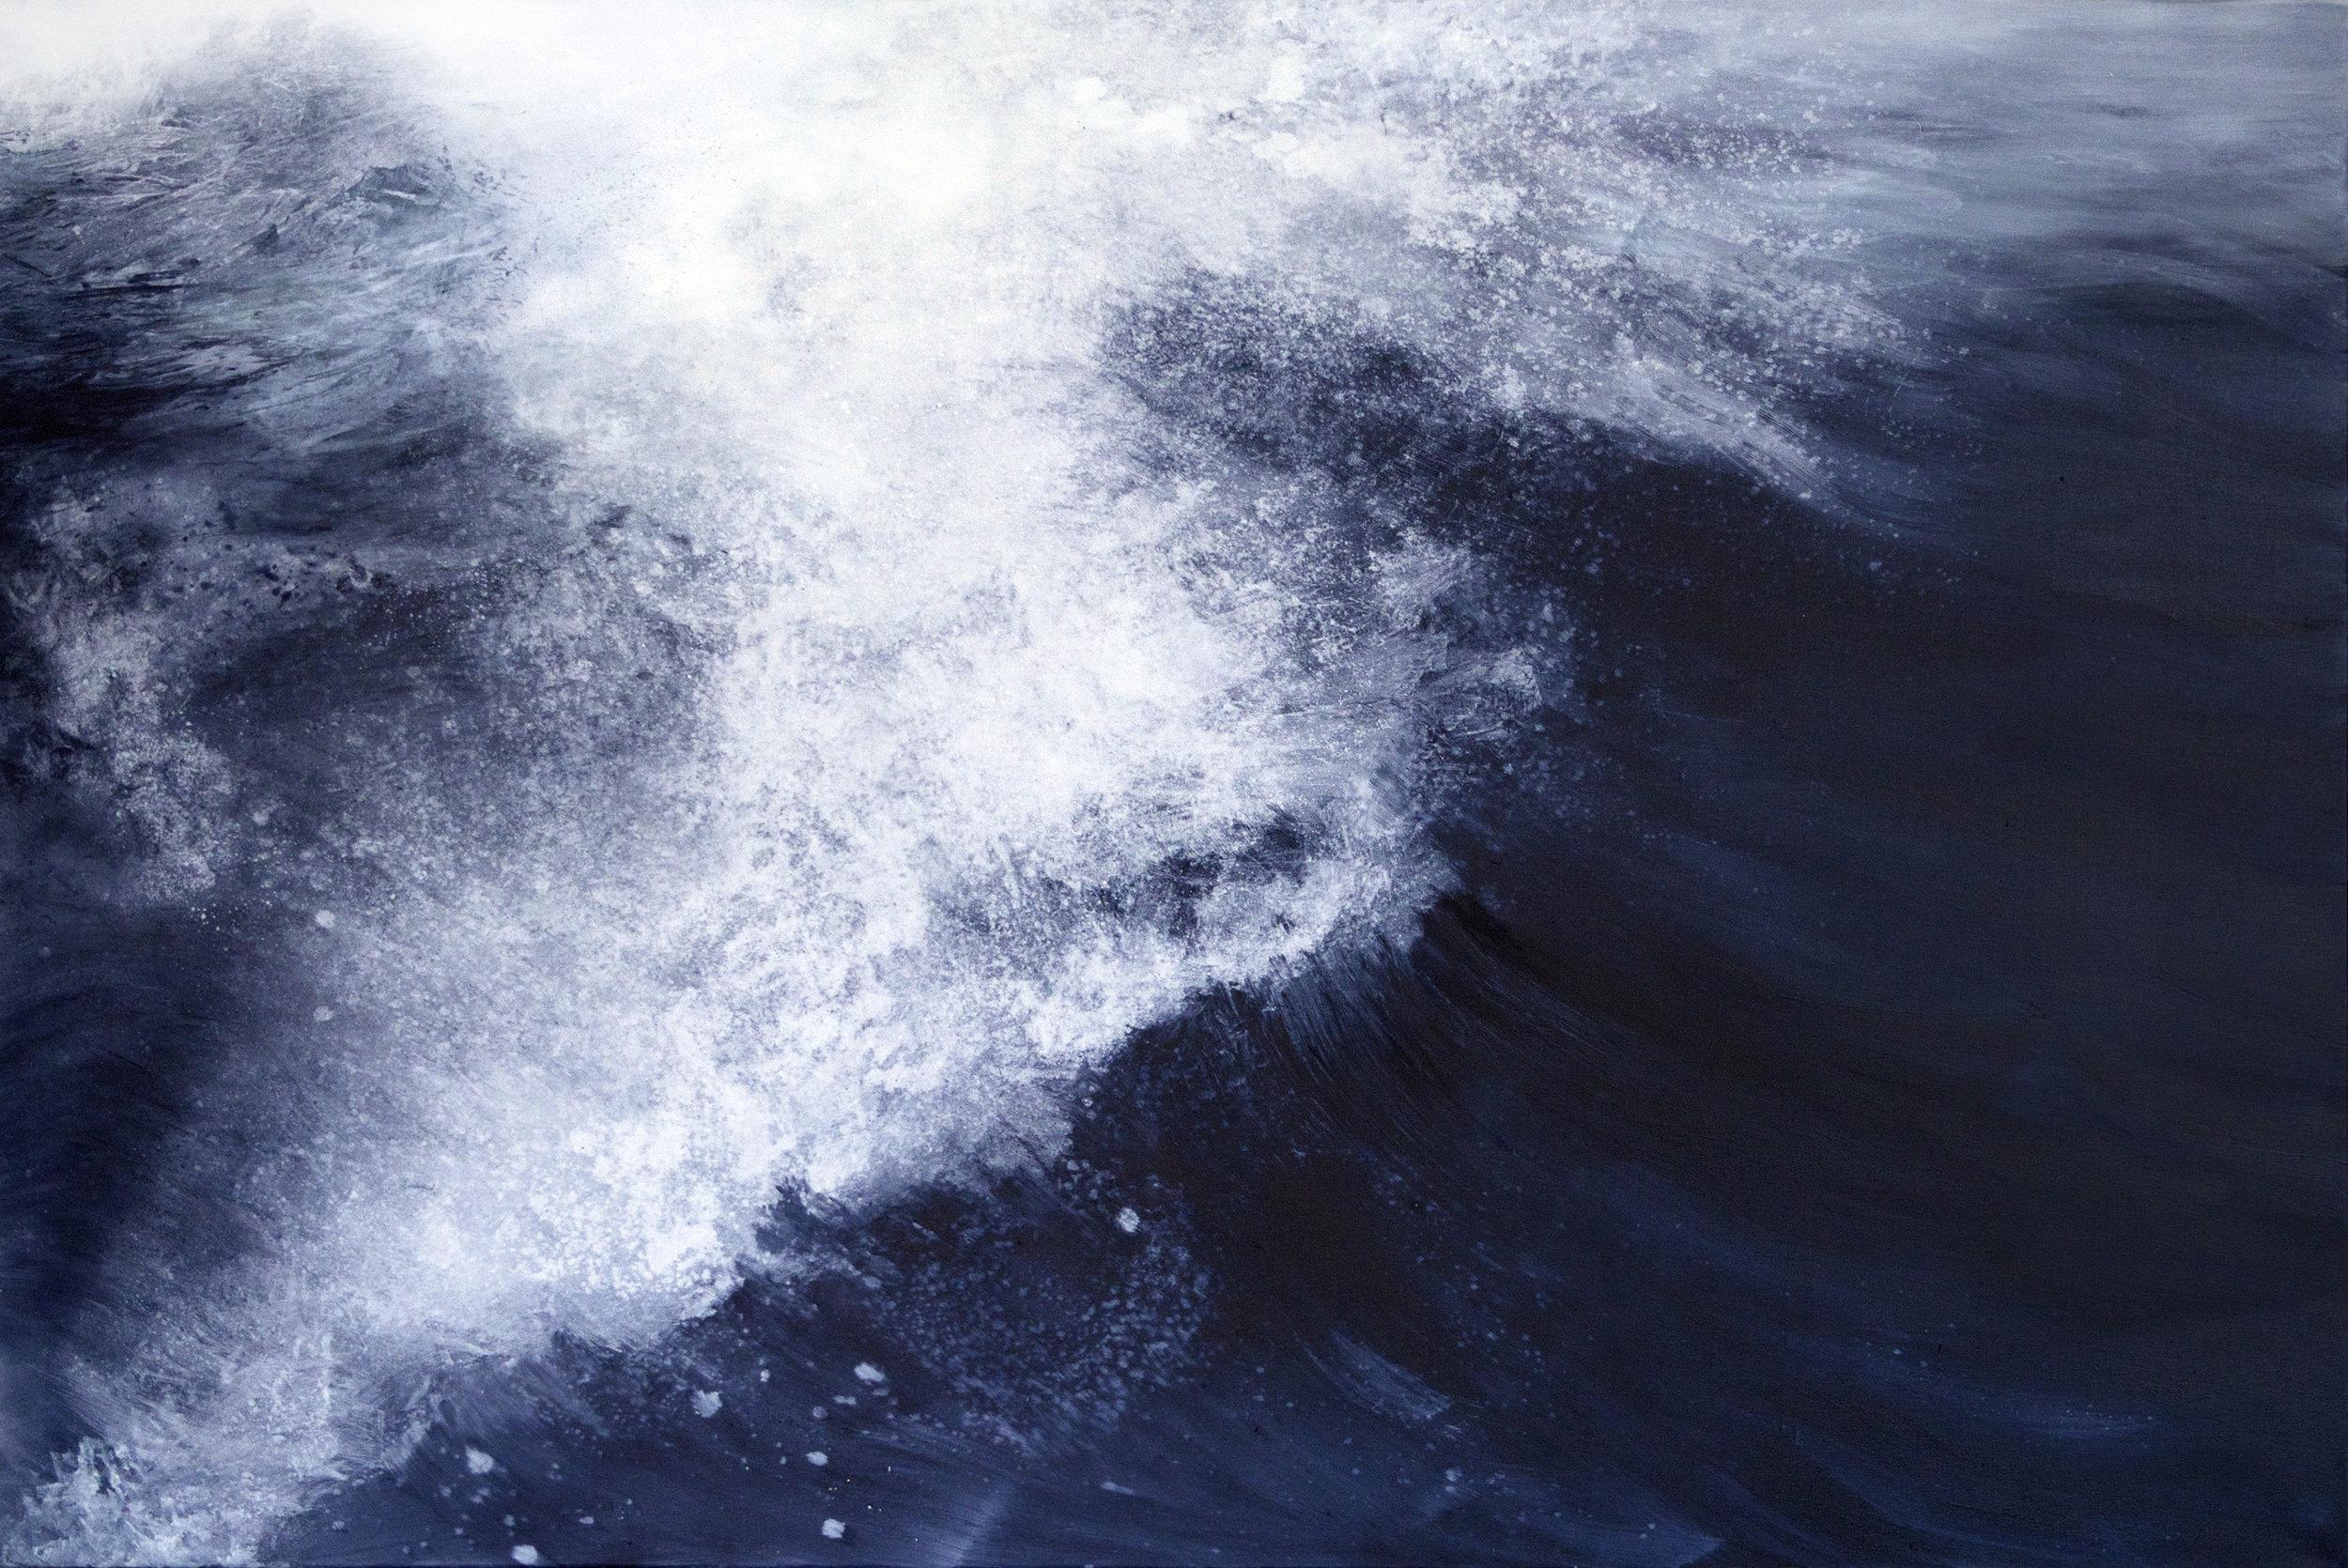 Blue Black. Wave, oil on canvas, 180x120cm, 2015